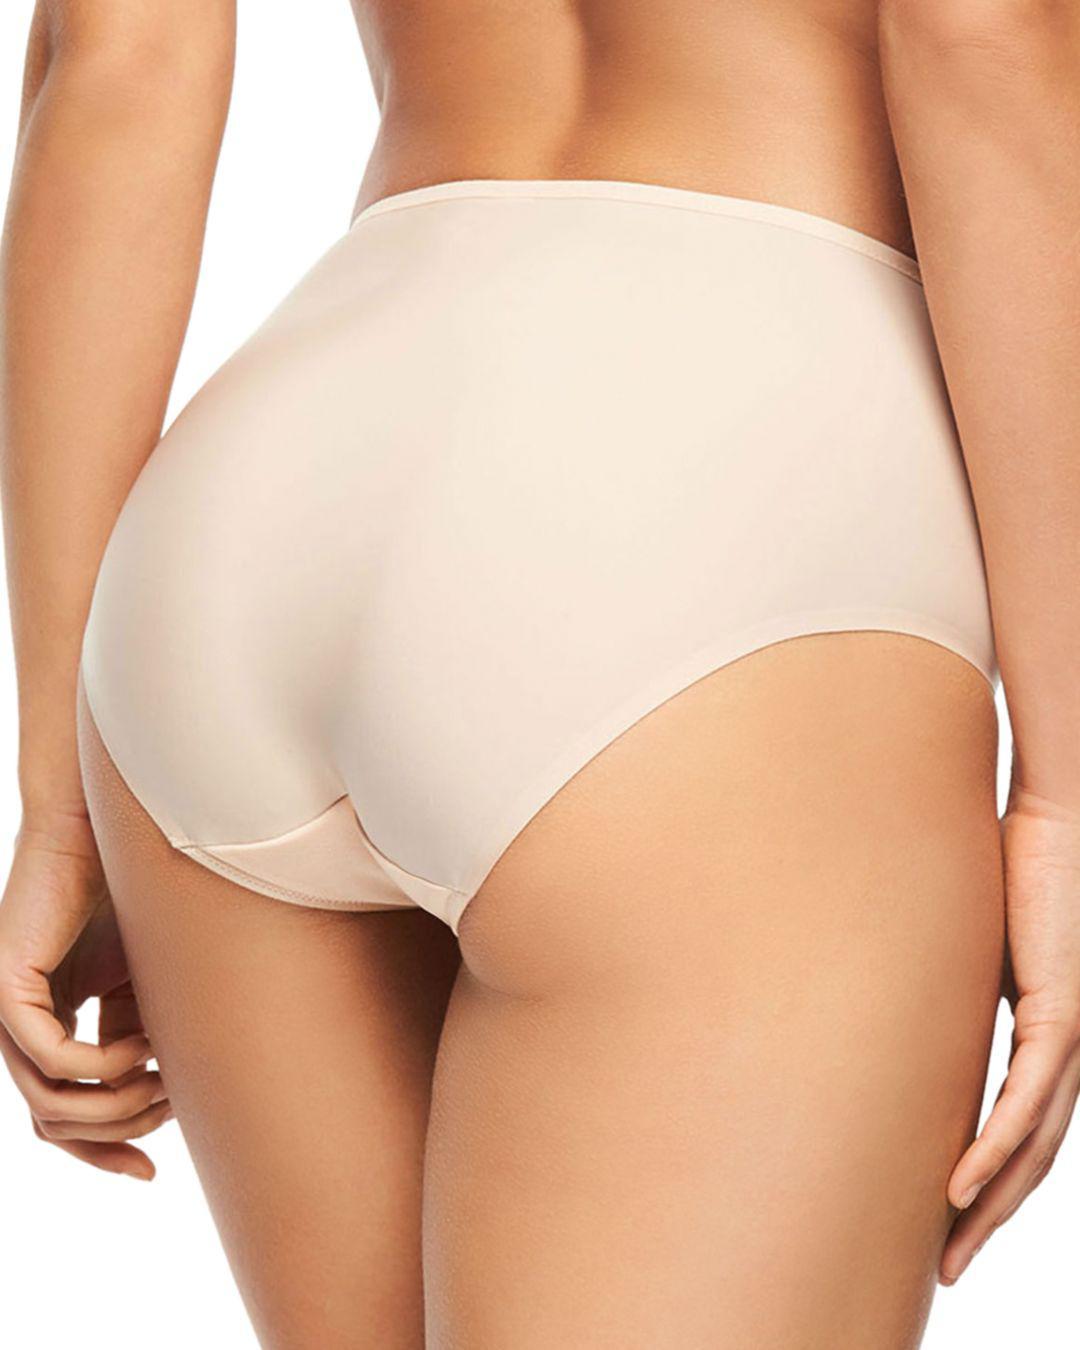 d61a5fb4a8 Lyst - Chantelle C Magnifique Sexy High-waist Briefs in Natural